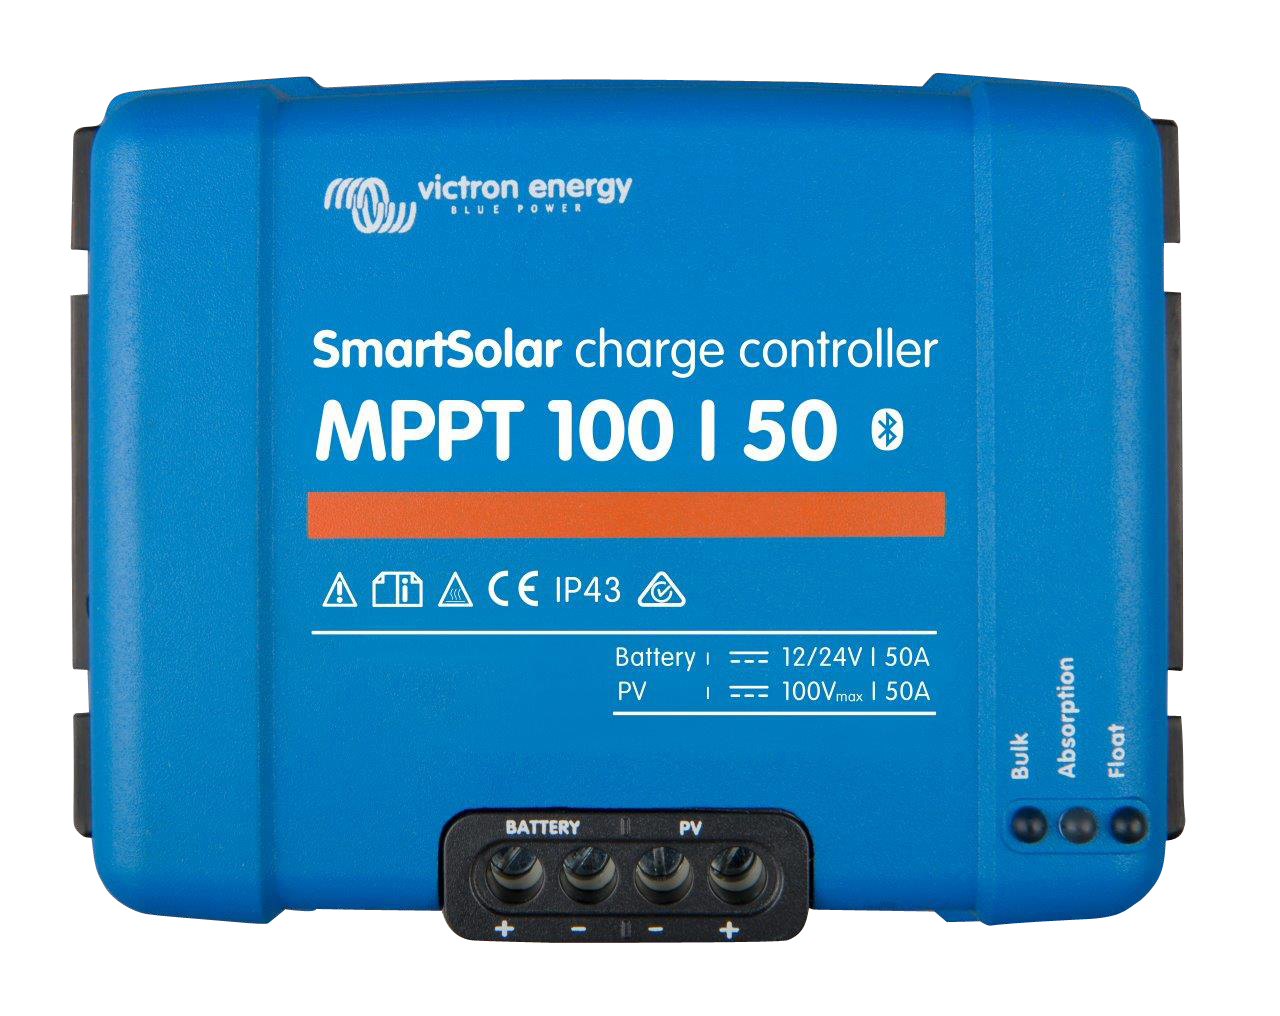 1 Stk Smartsolar Laderegler MPPT 100/50-50A (12/24V) PVBC10050S